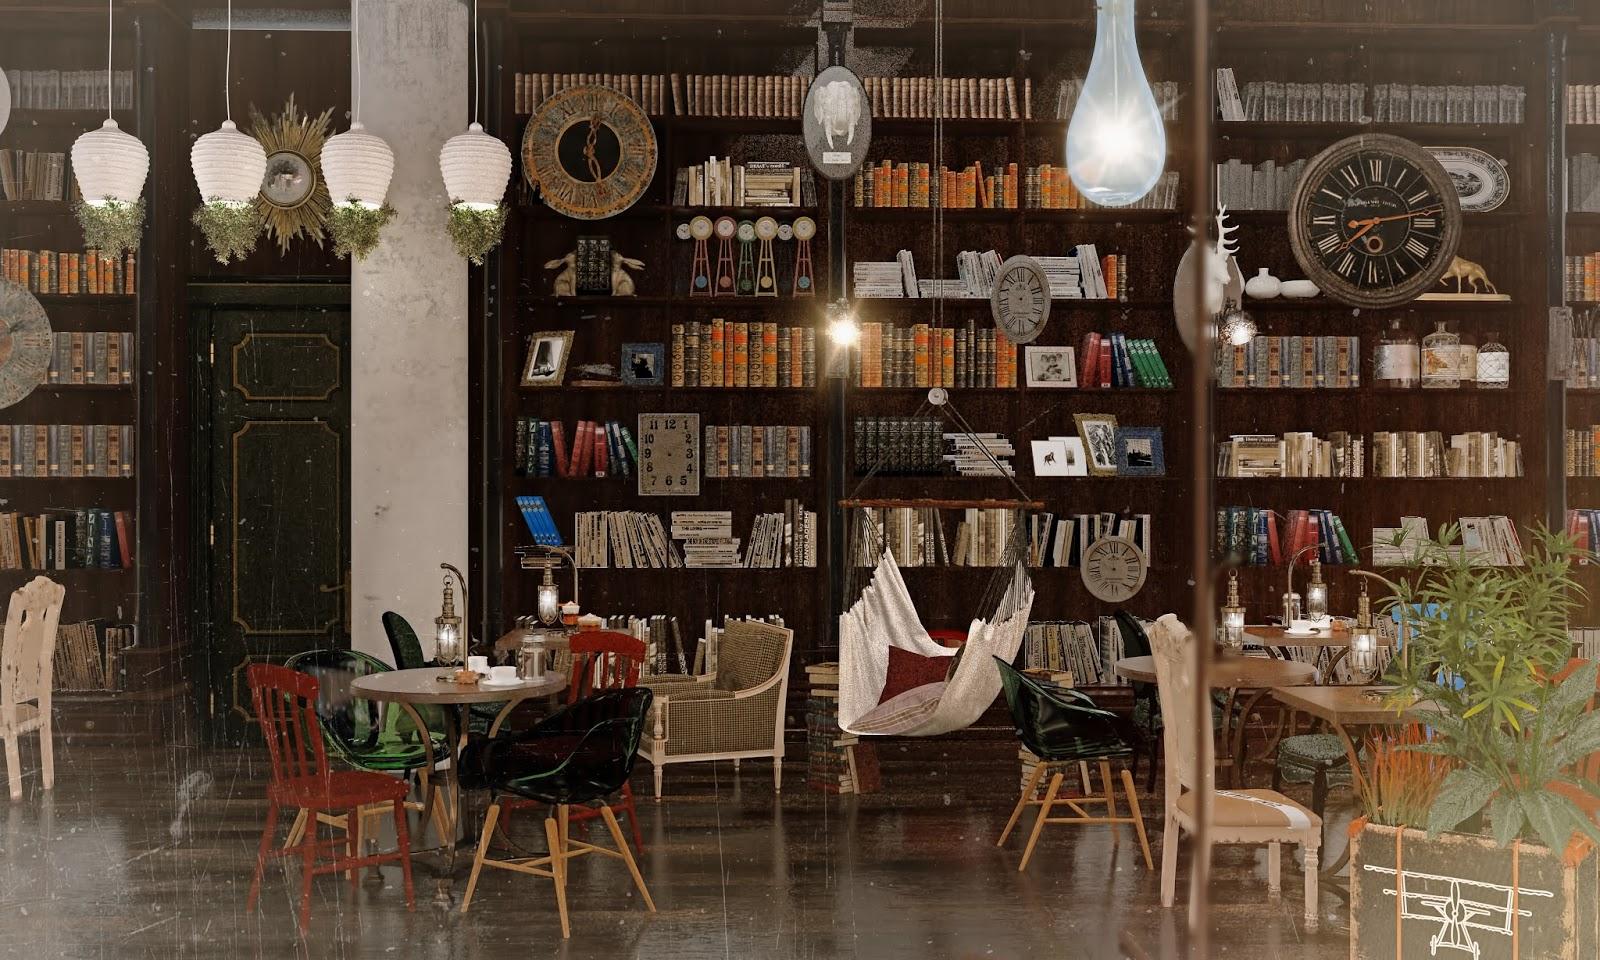 Darya girina interior design march 2015 - Darya Girina Interior Design Hipsters Cafe In Moscow Industrial Loft Retro Cafe Bar